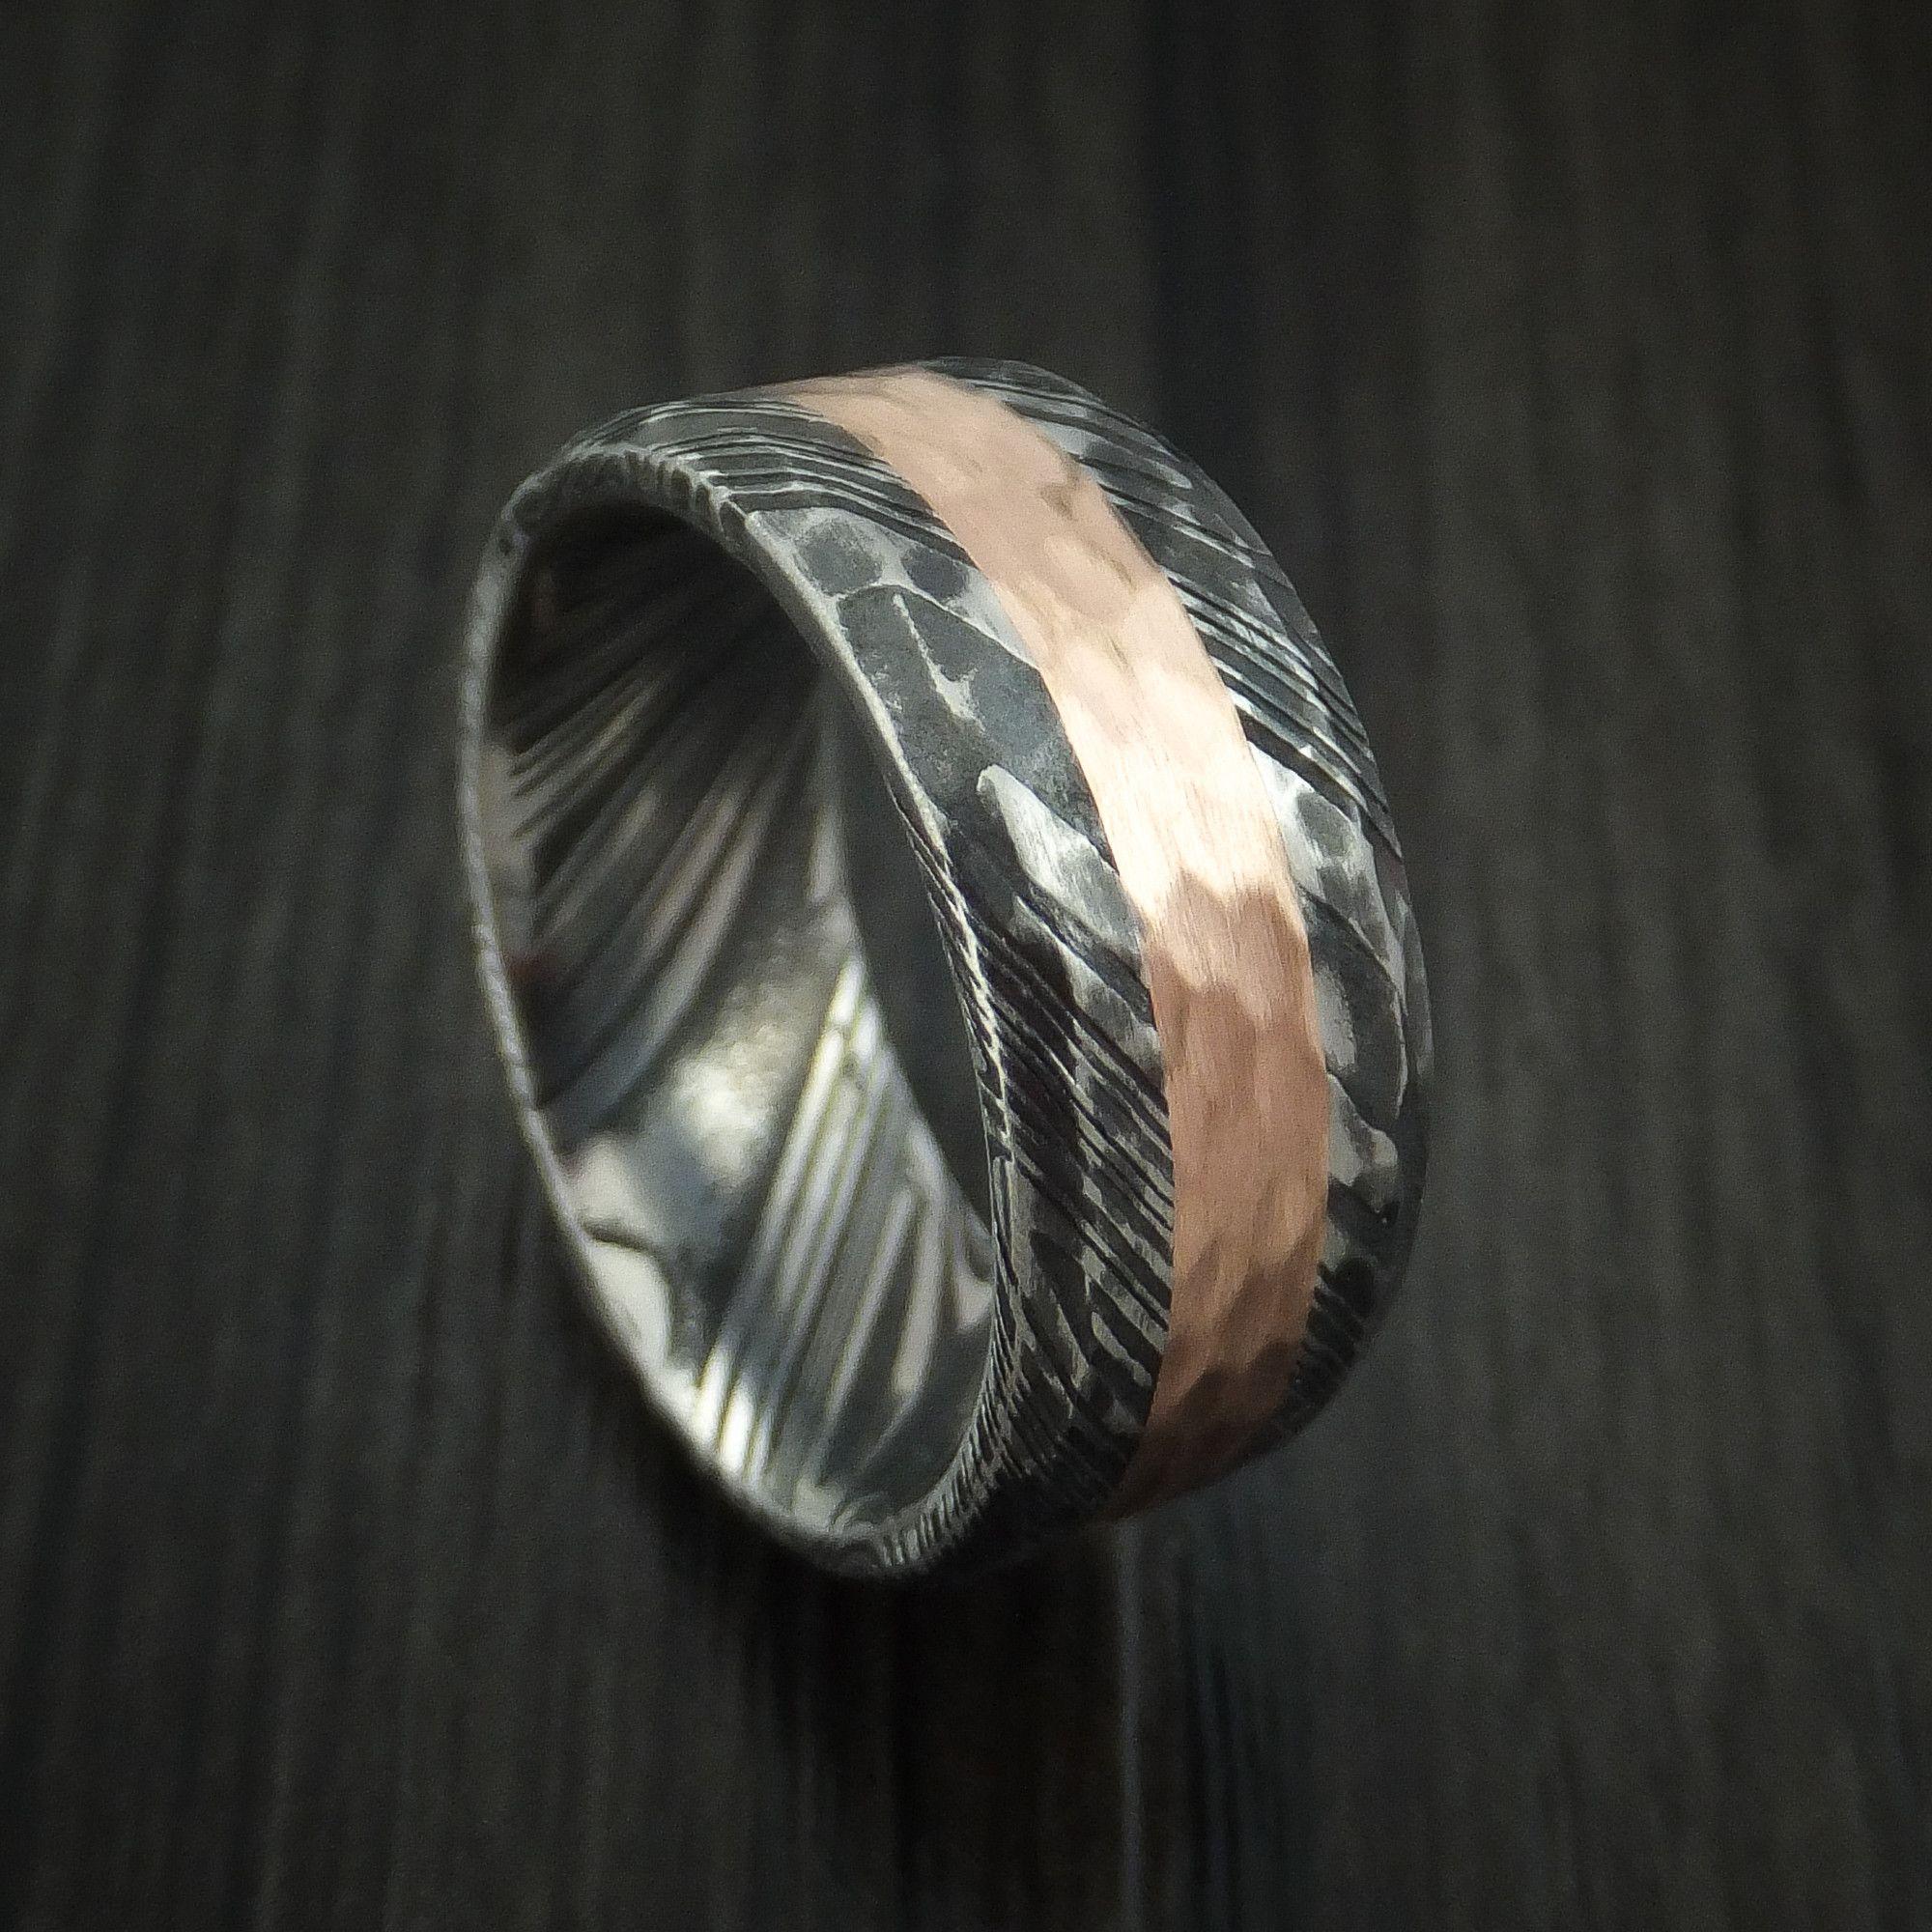 Kuro Damascus Steel Ring And 14k Rose Gold Wedding Band Hammered Genuine Craftsmanship Custom Made Damascus Steel Ring Mens Wedding Rings 14k Rose Gold Wedding Band